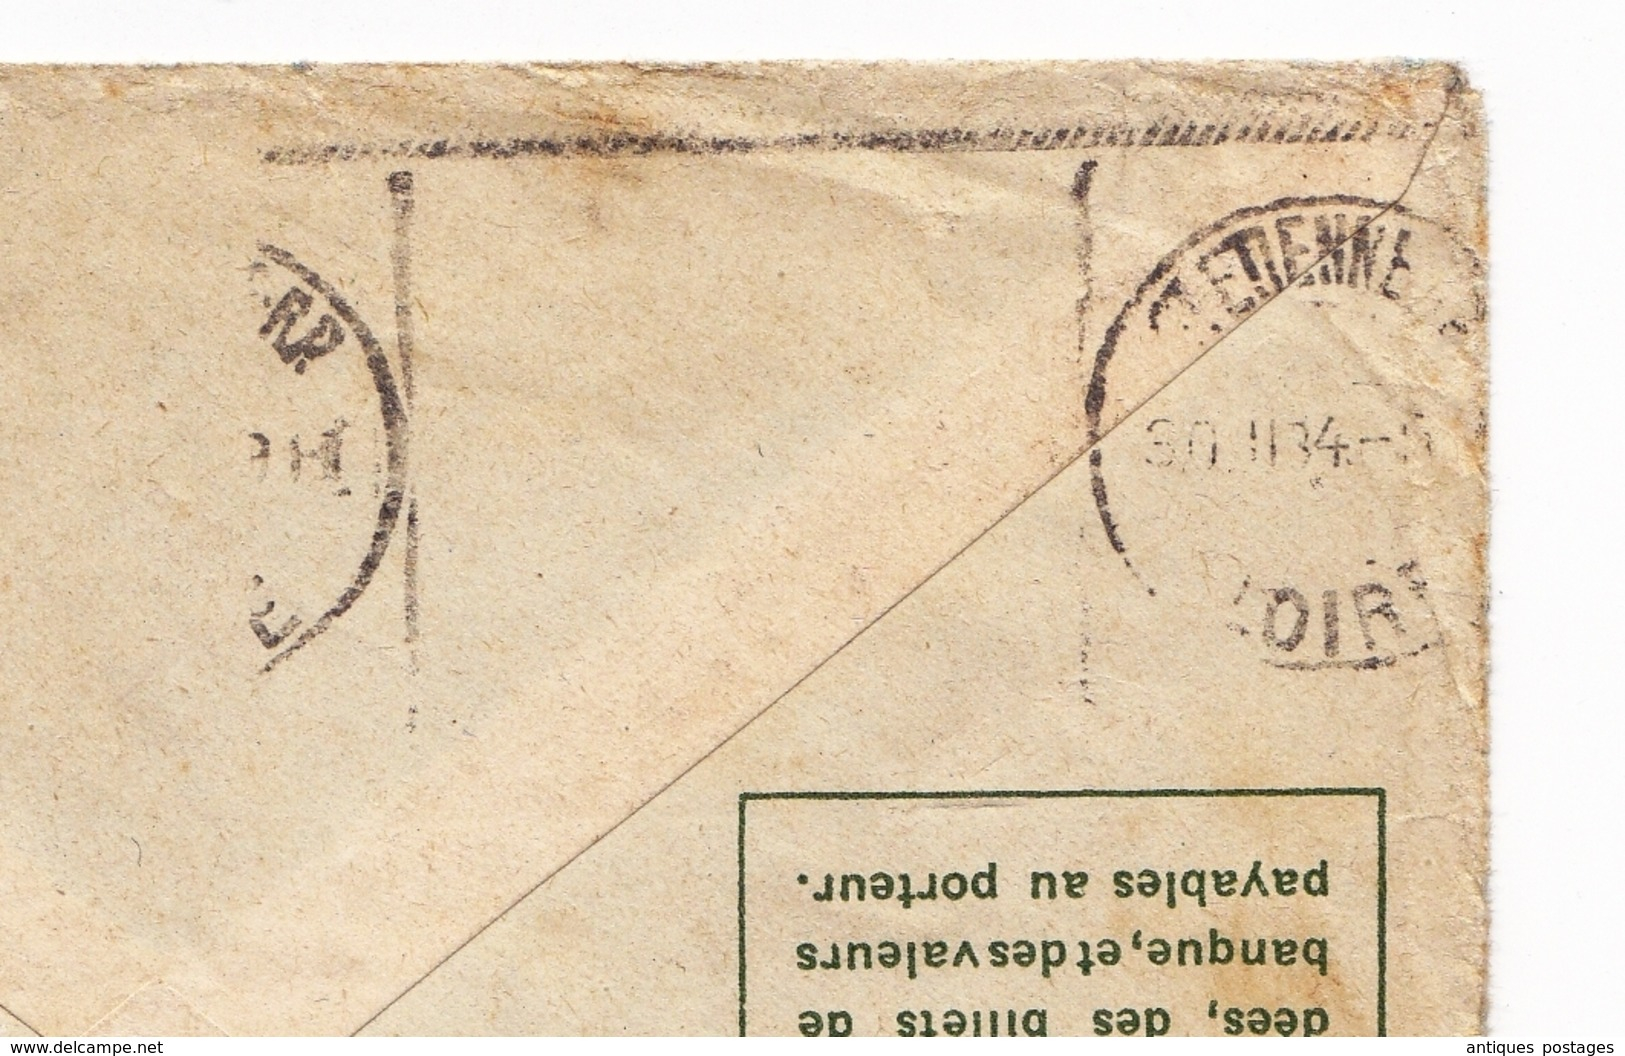 Entier Postal 1934 Tananarive Antananarivo Rue Gallieni Madagascar T.S.F. Saint Etienne Loire - Lettres & Documents